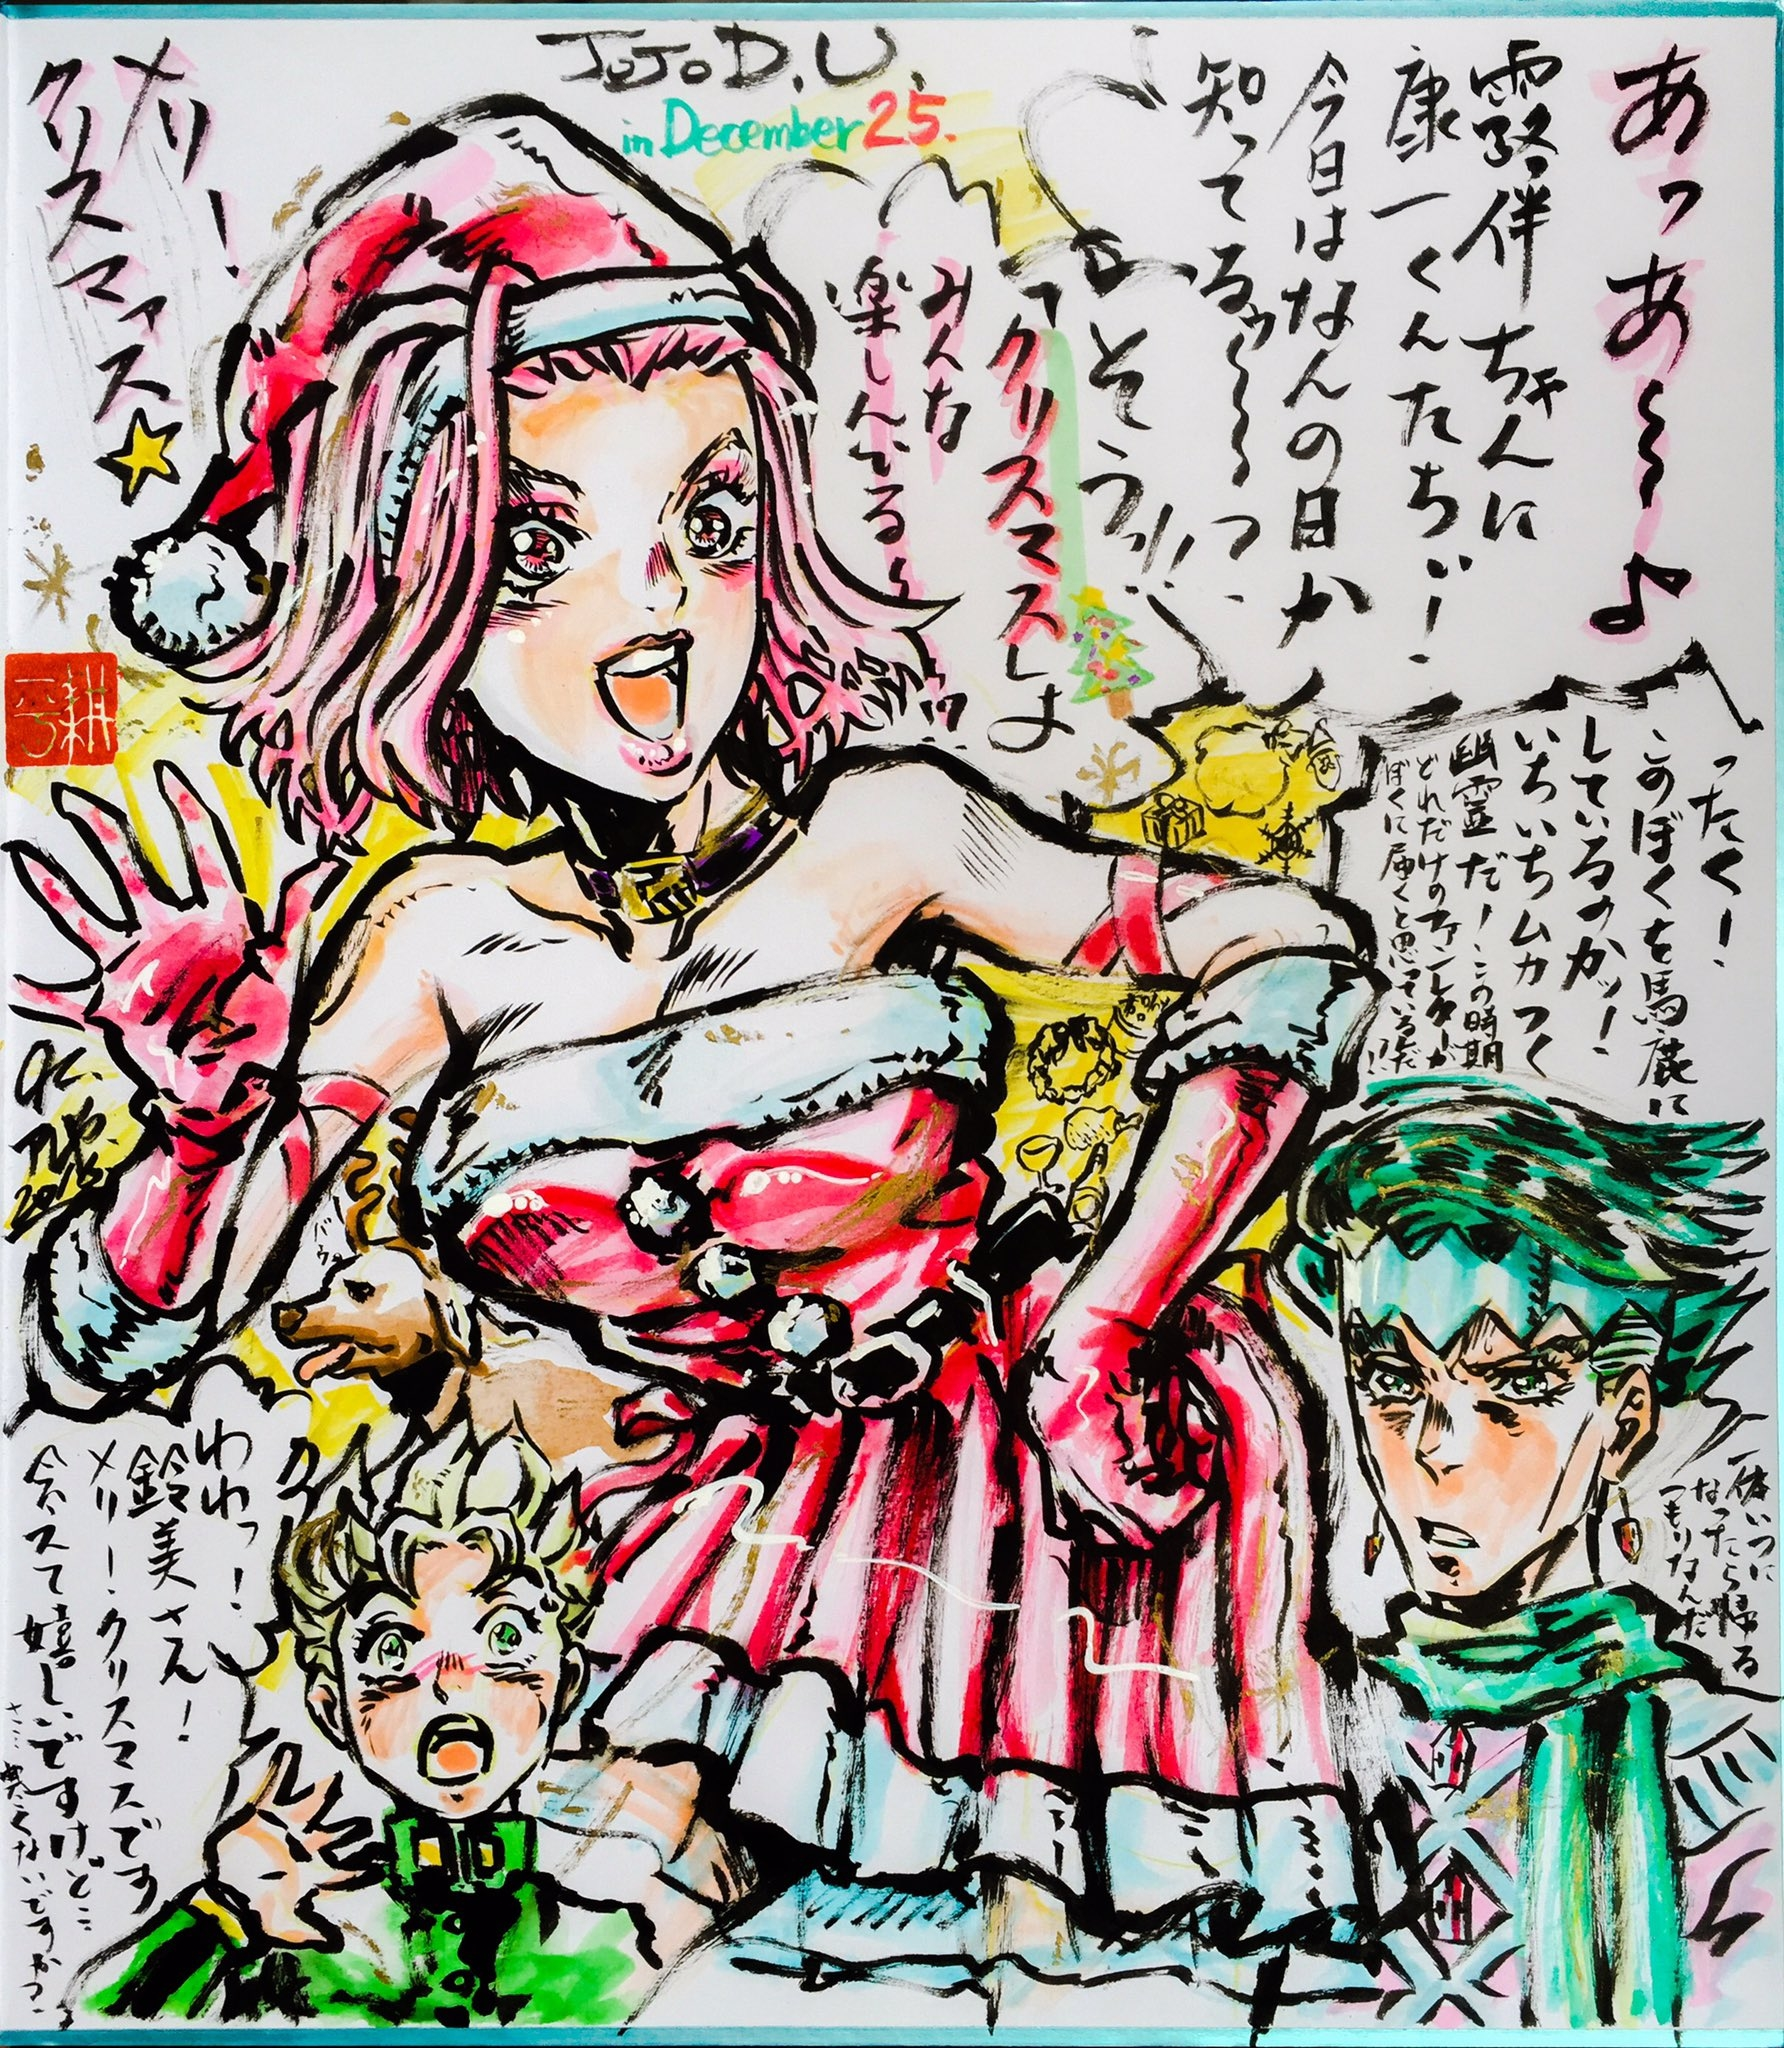 Christmas Reimi | JoJo\'s Bizarre Adventure | Know Your Meme